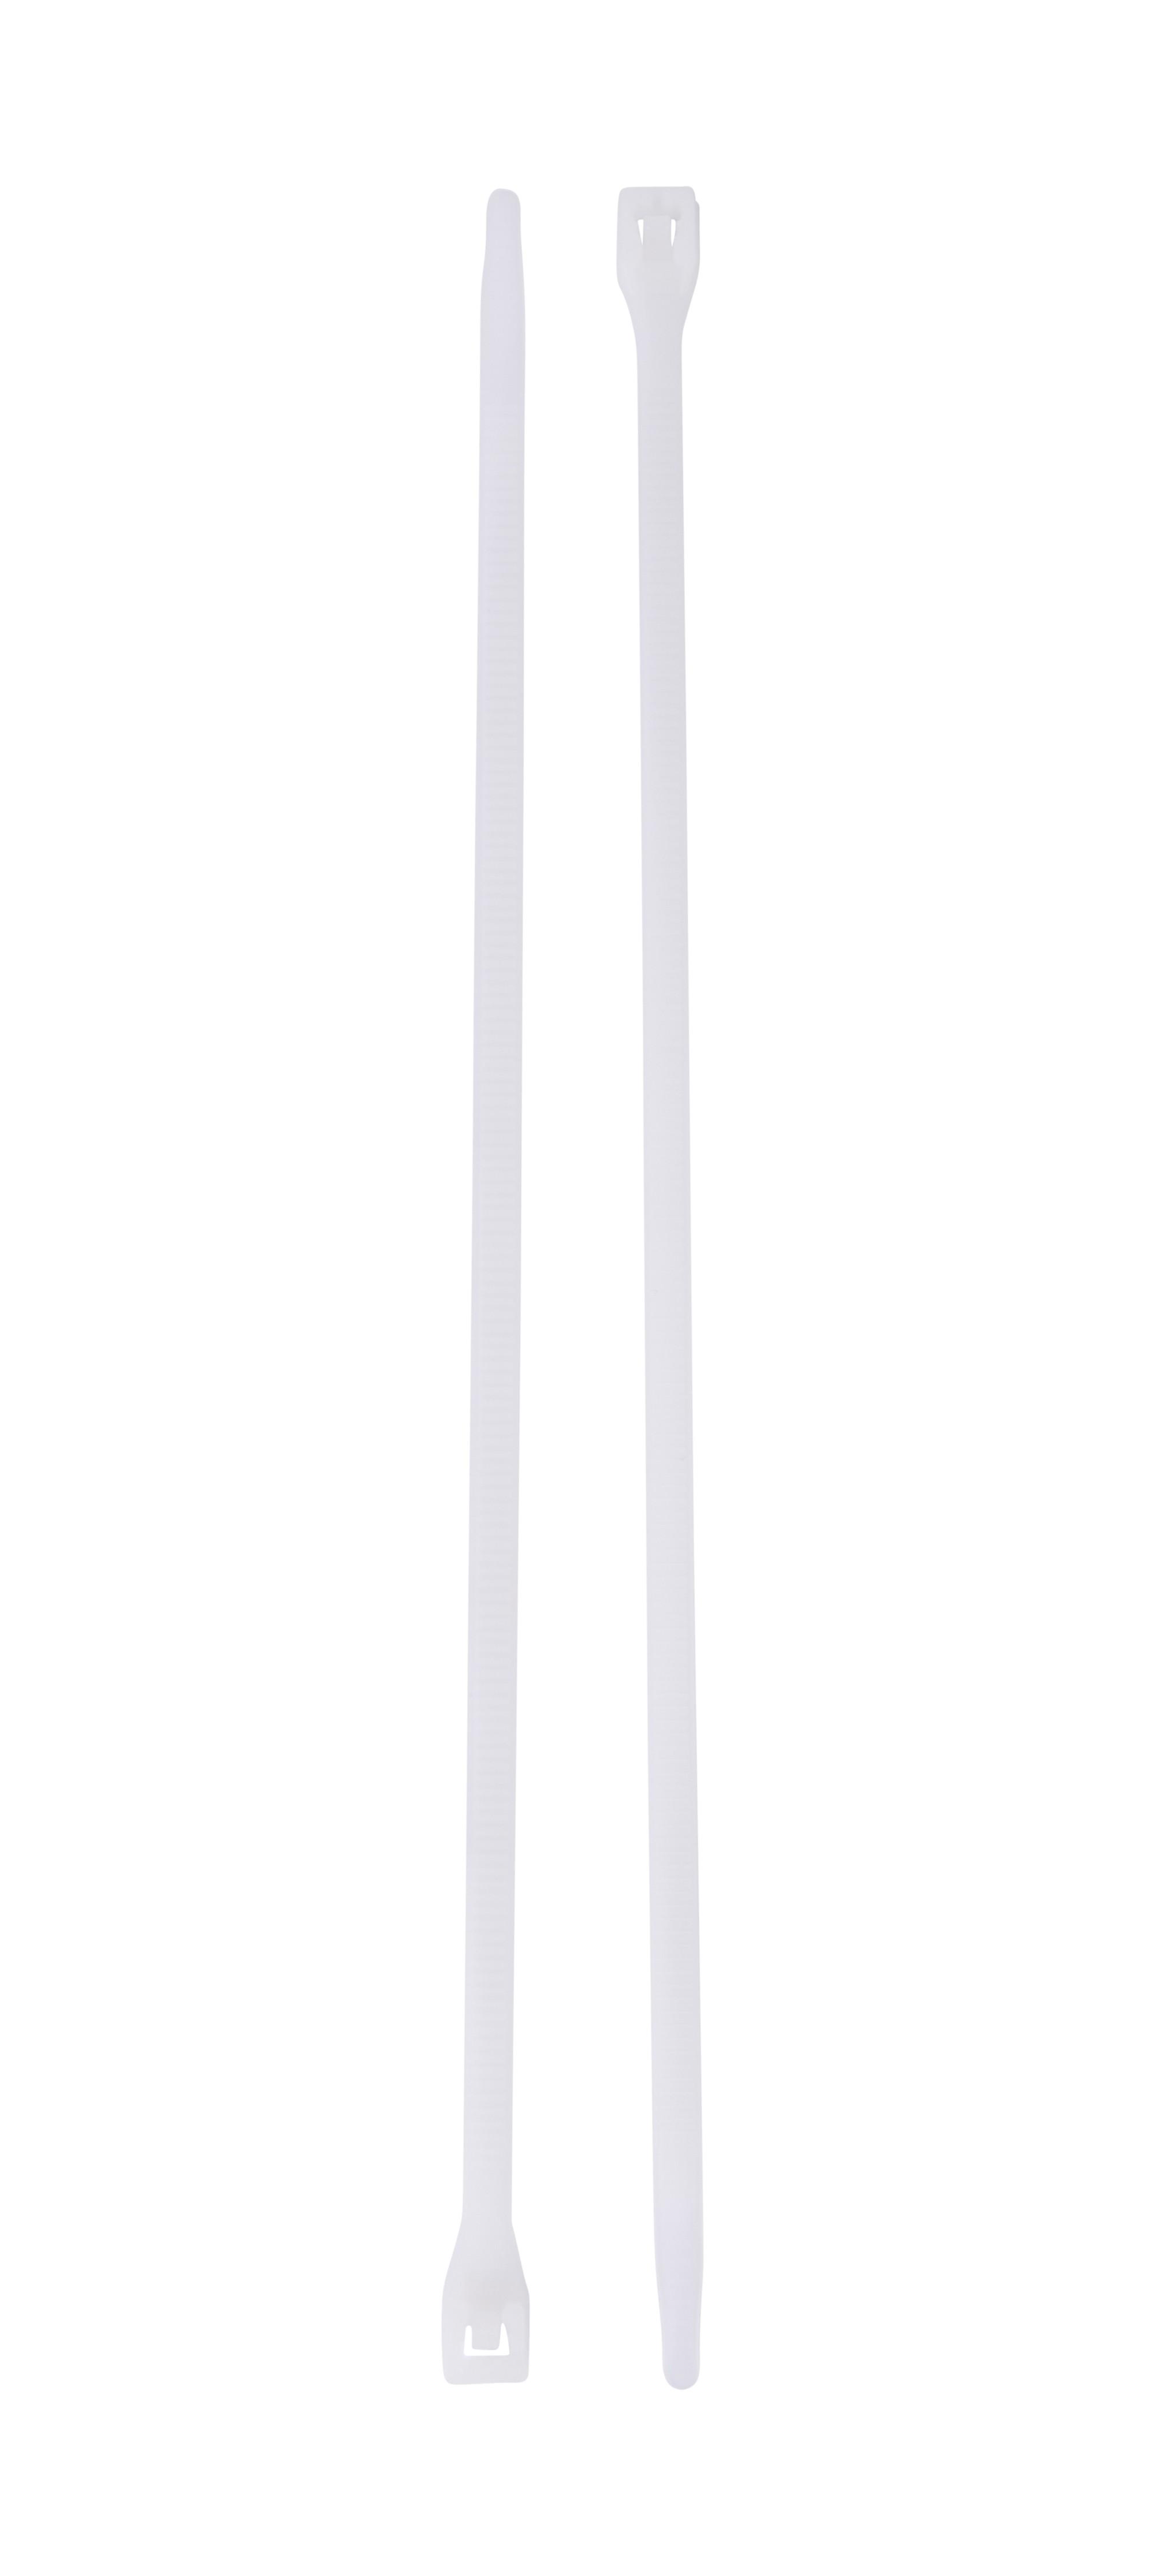 Gardner Bender Cable Tie